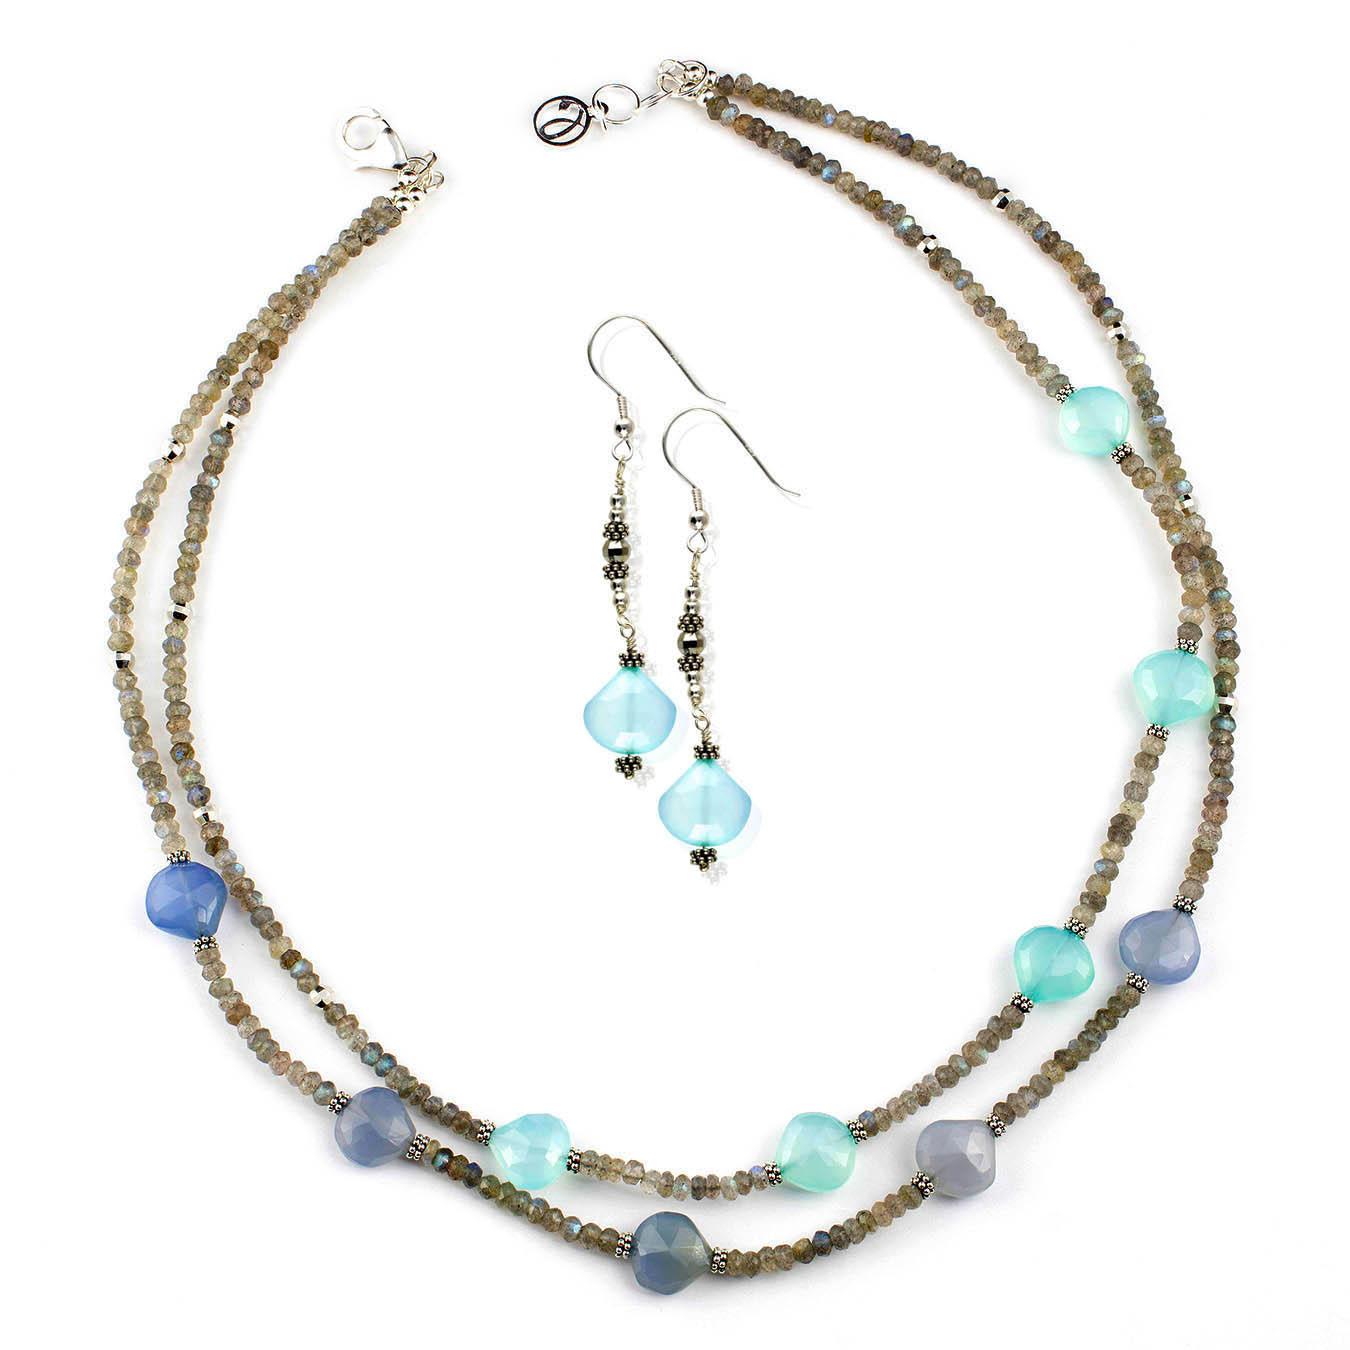 Artisan beaded jewelry made of labradorite and chalcedony gemstones